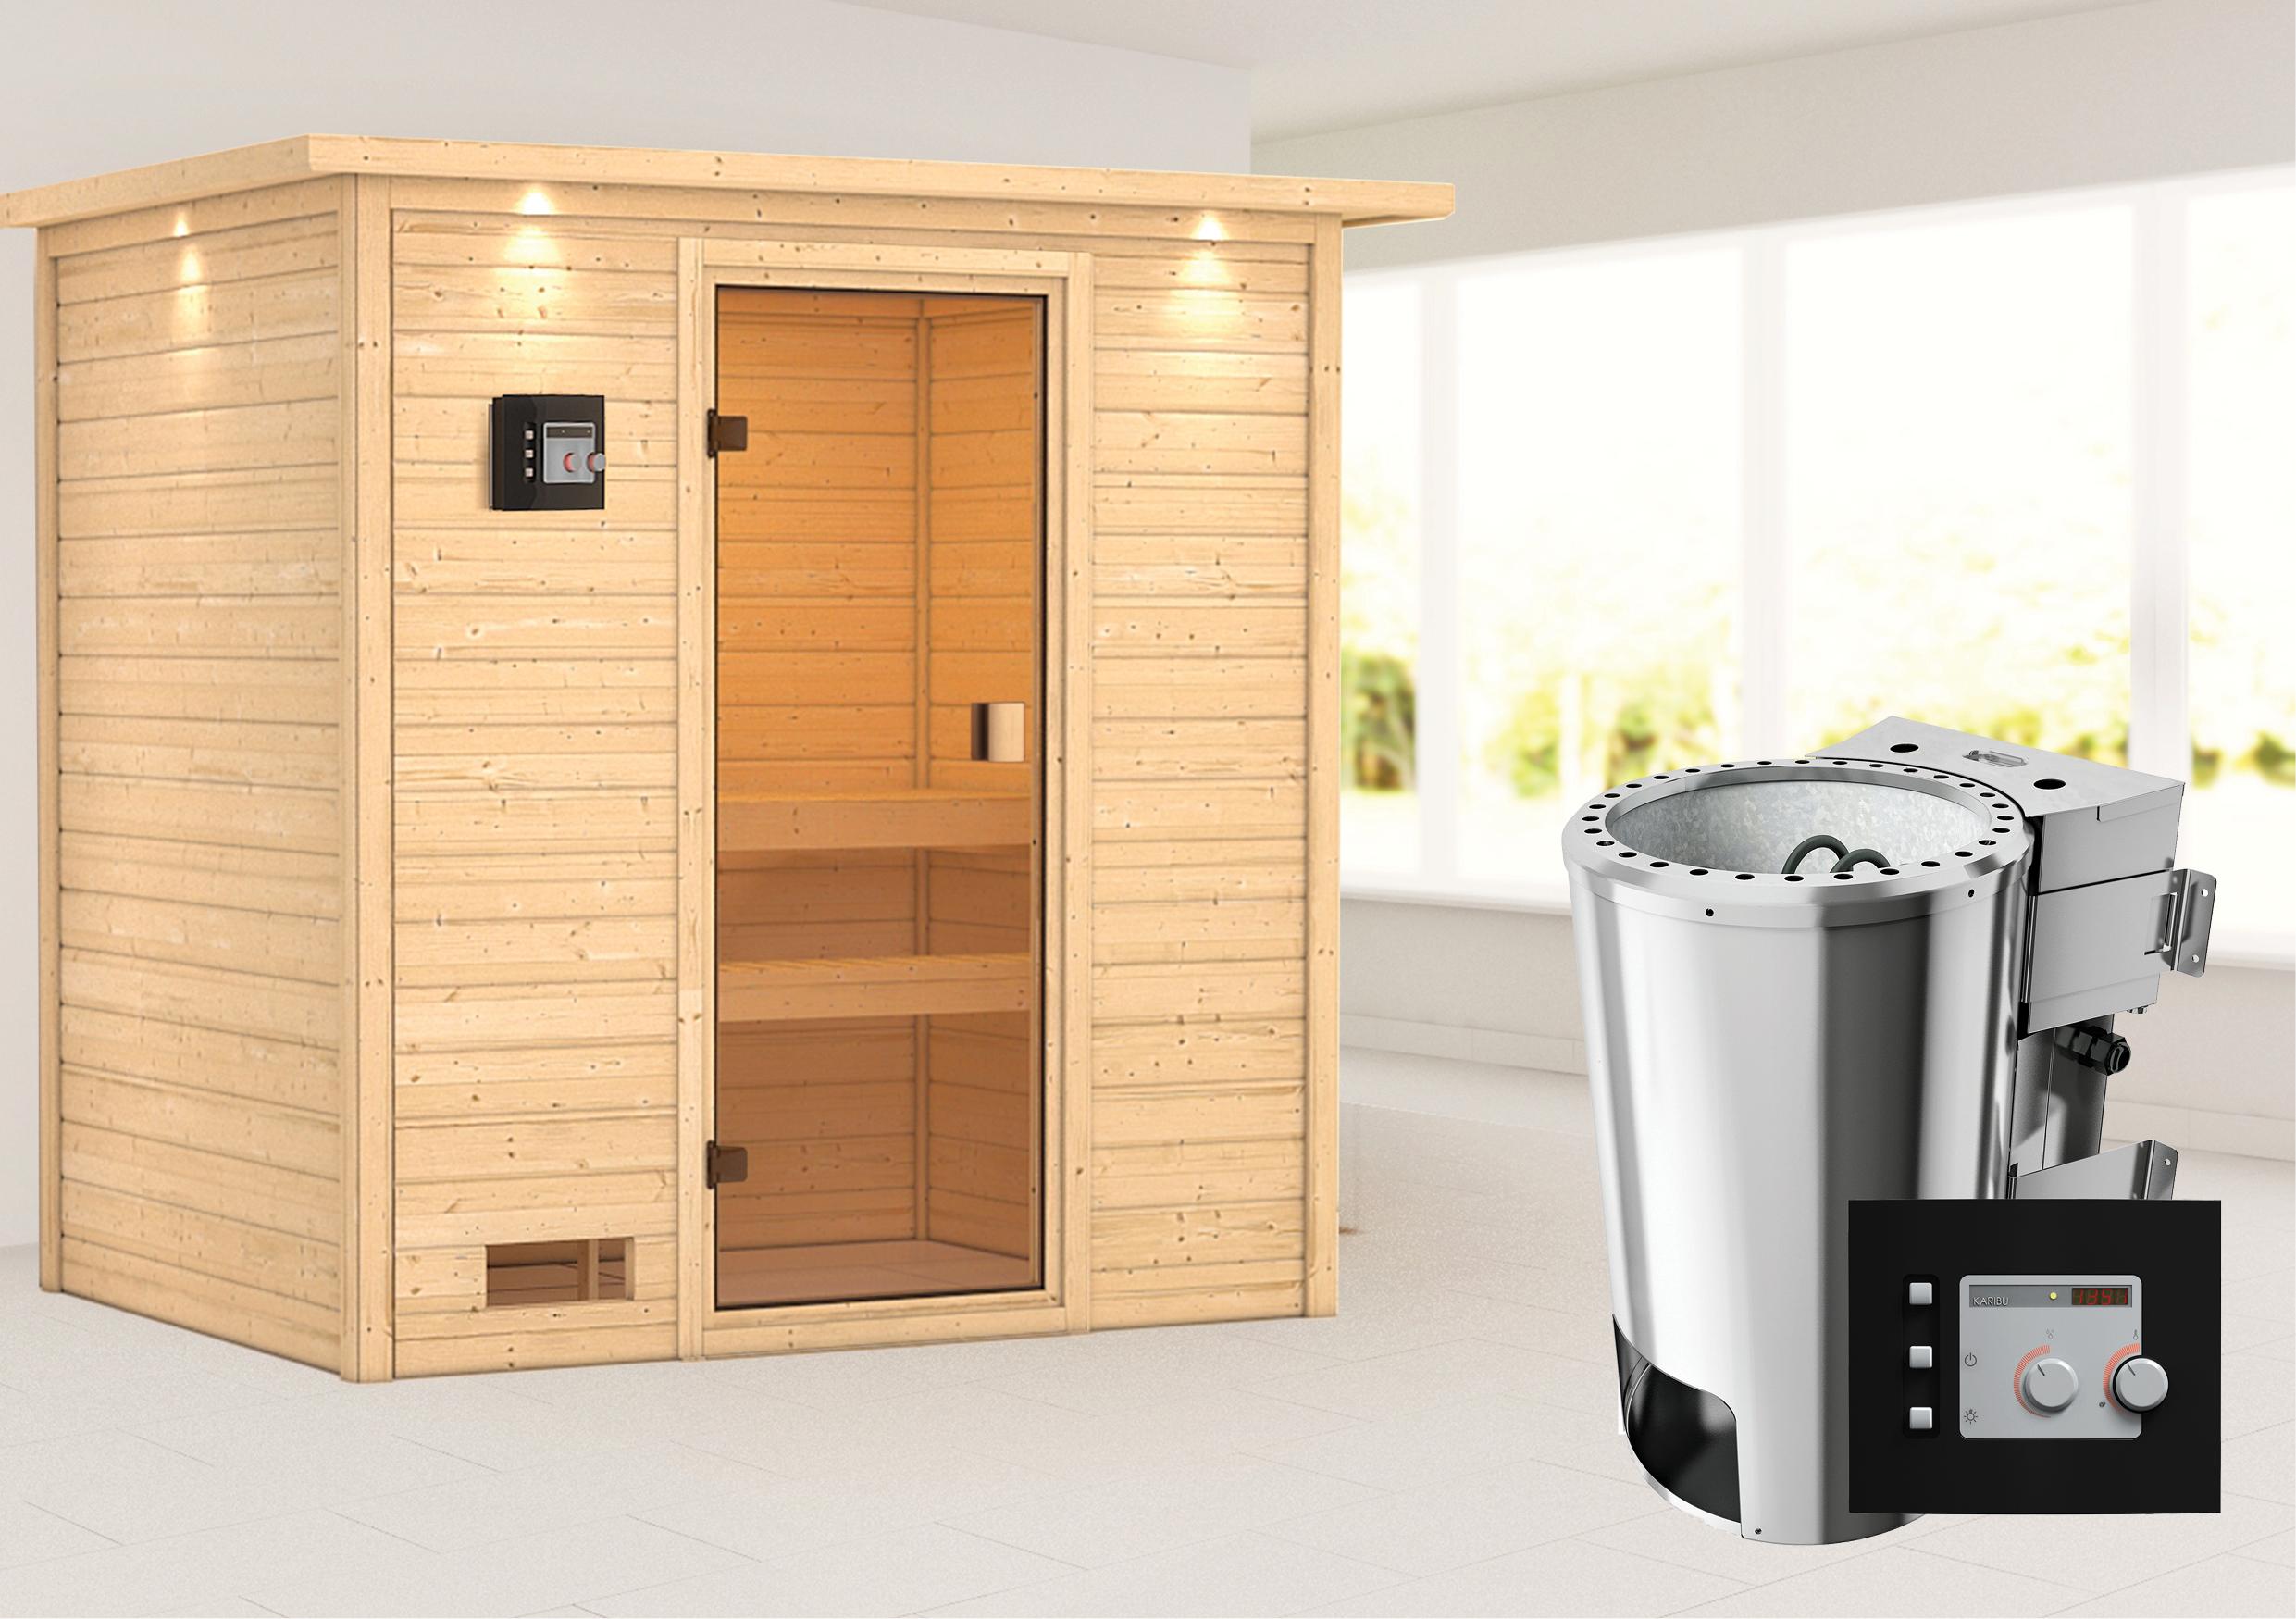 Woodfeeling Sauna Selena 38mm Dachkranz 230V Bio Saunaofen 3,6 kW ext. Bild 1